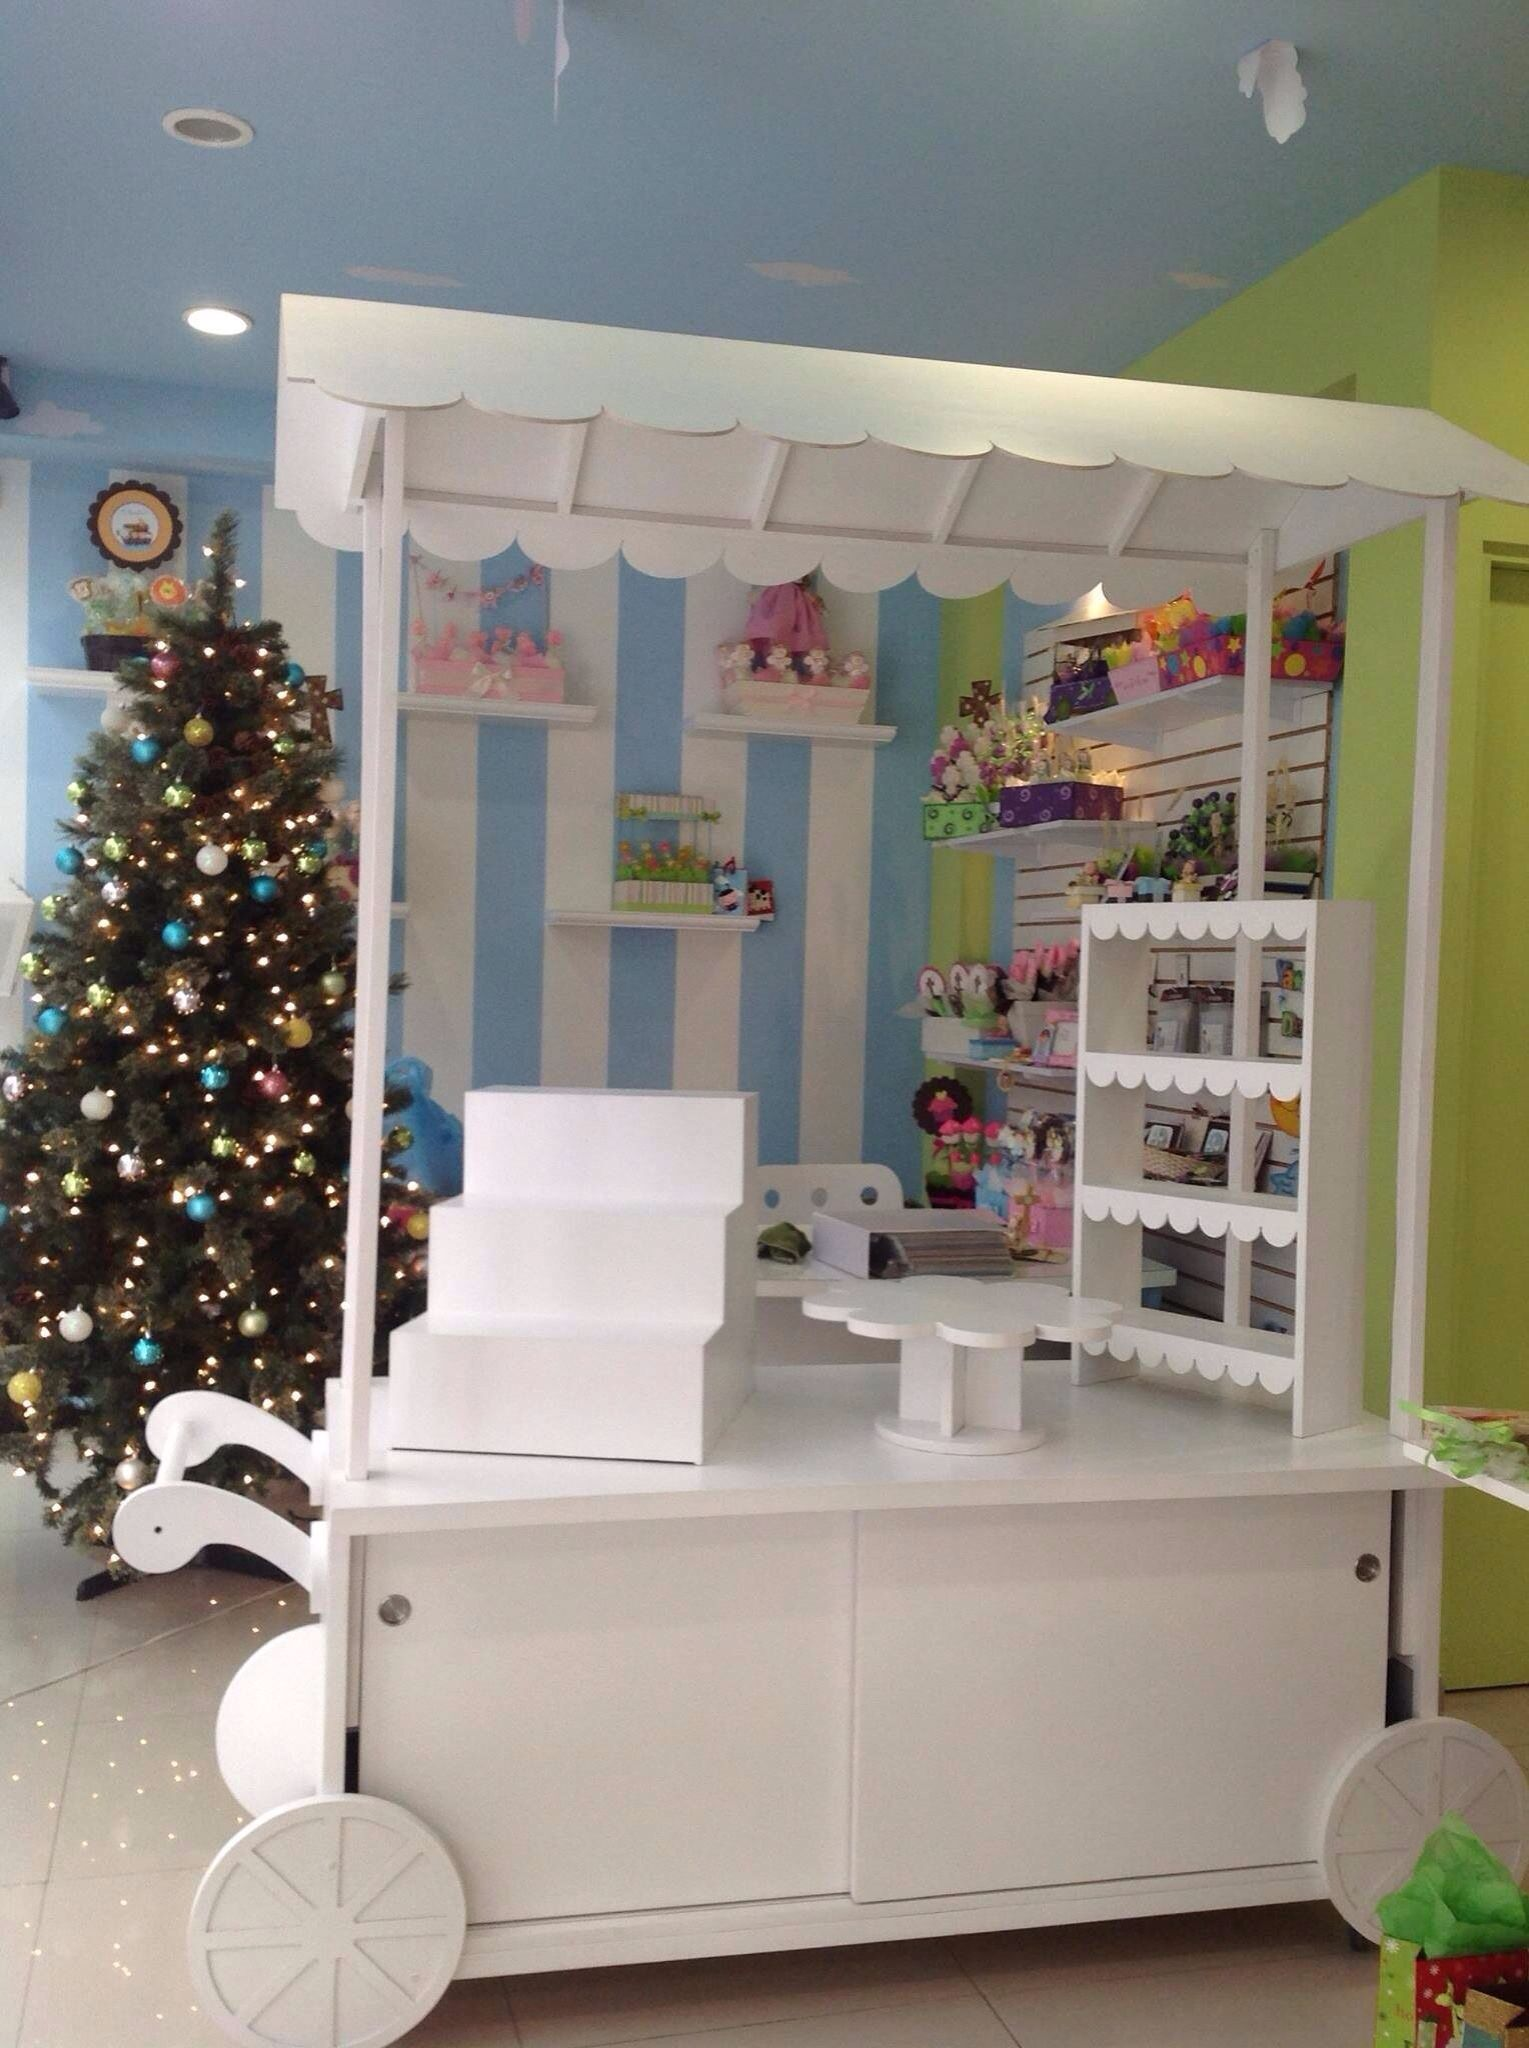 carreta para mesas de dulces candy bar 2 pinterest bar candy cart and fiestas. Black Bedroom Furniture Sets. Home Design Ideas